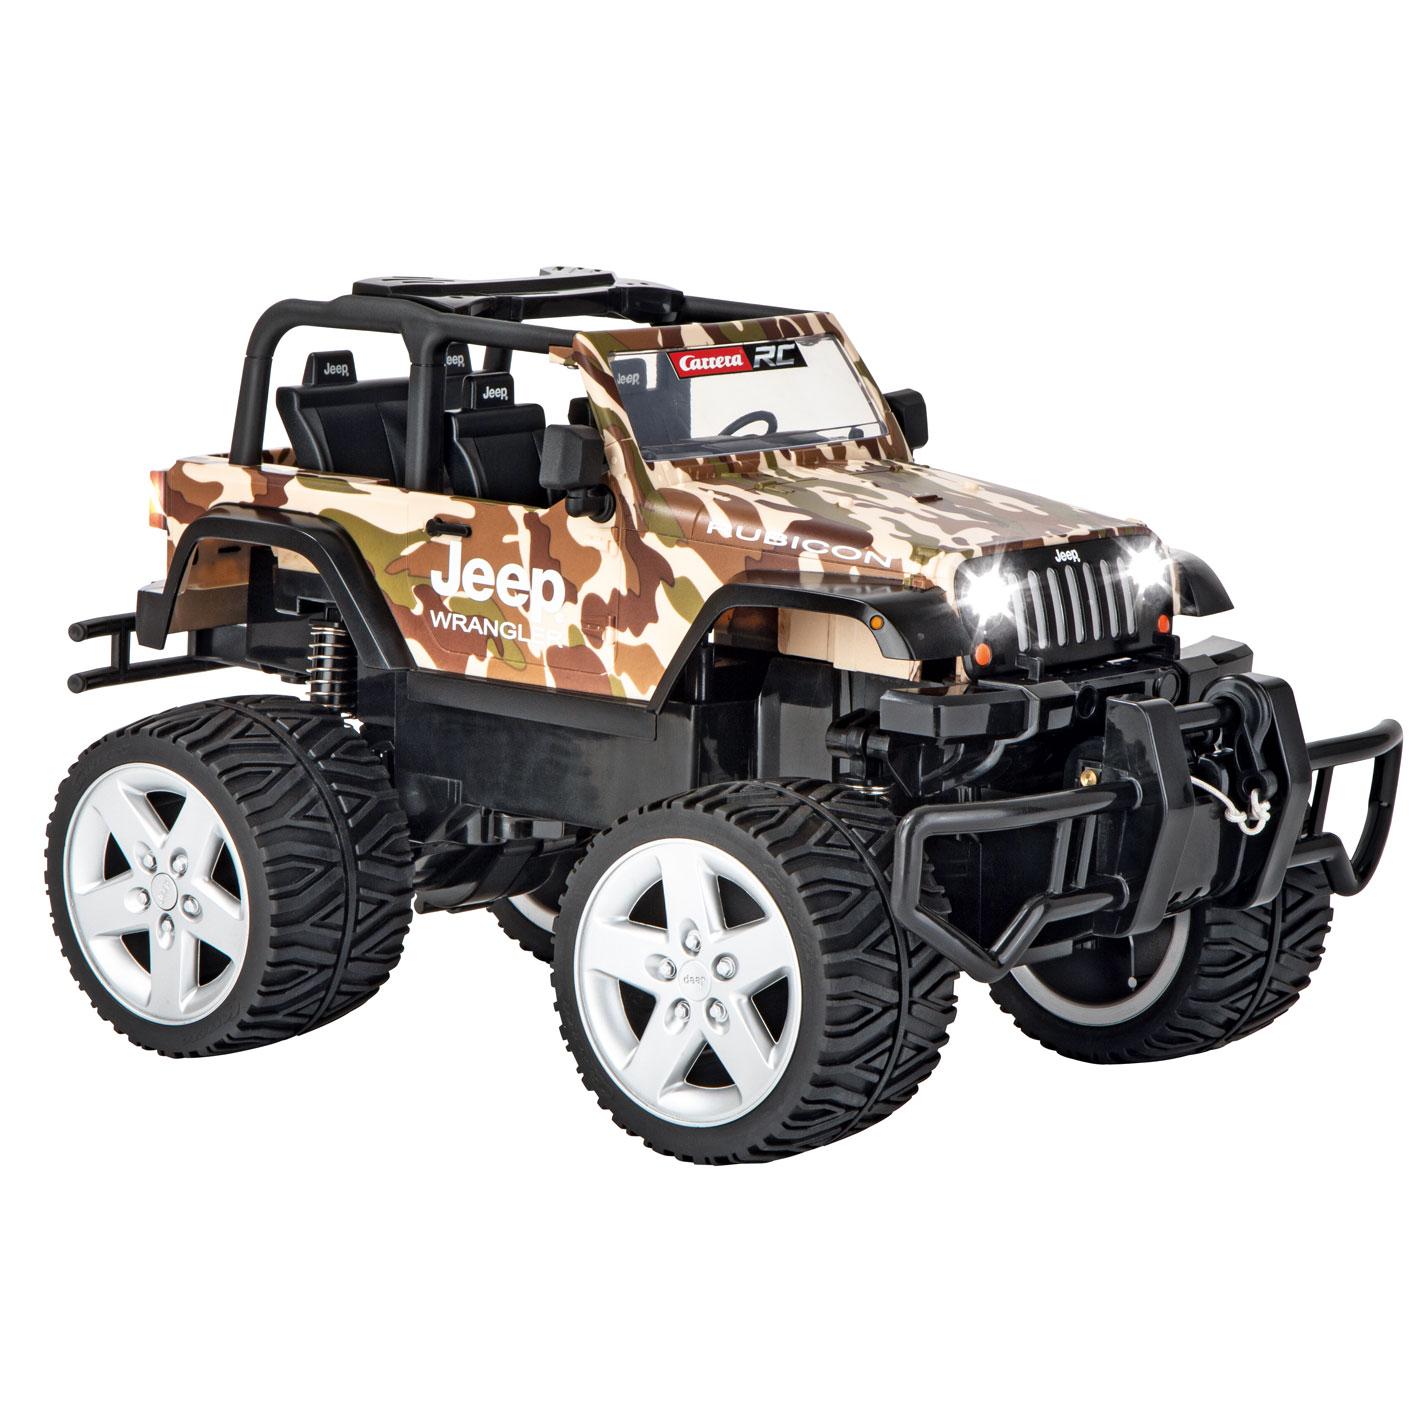 Carrera - Jeep[R] Wrangler Rubicon 2,4GHZ RC - Camouflage (370162122)